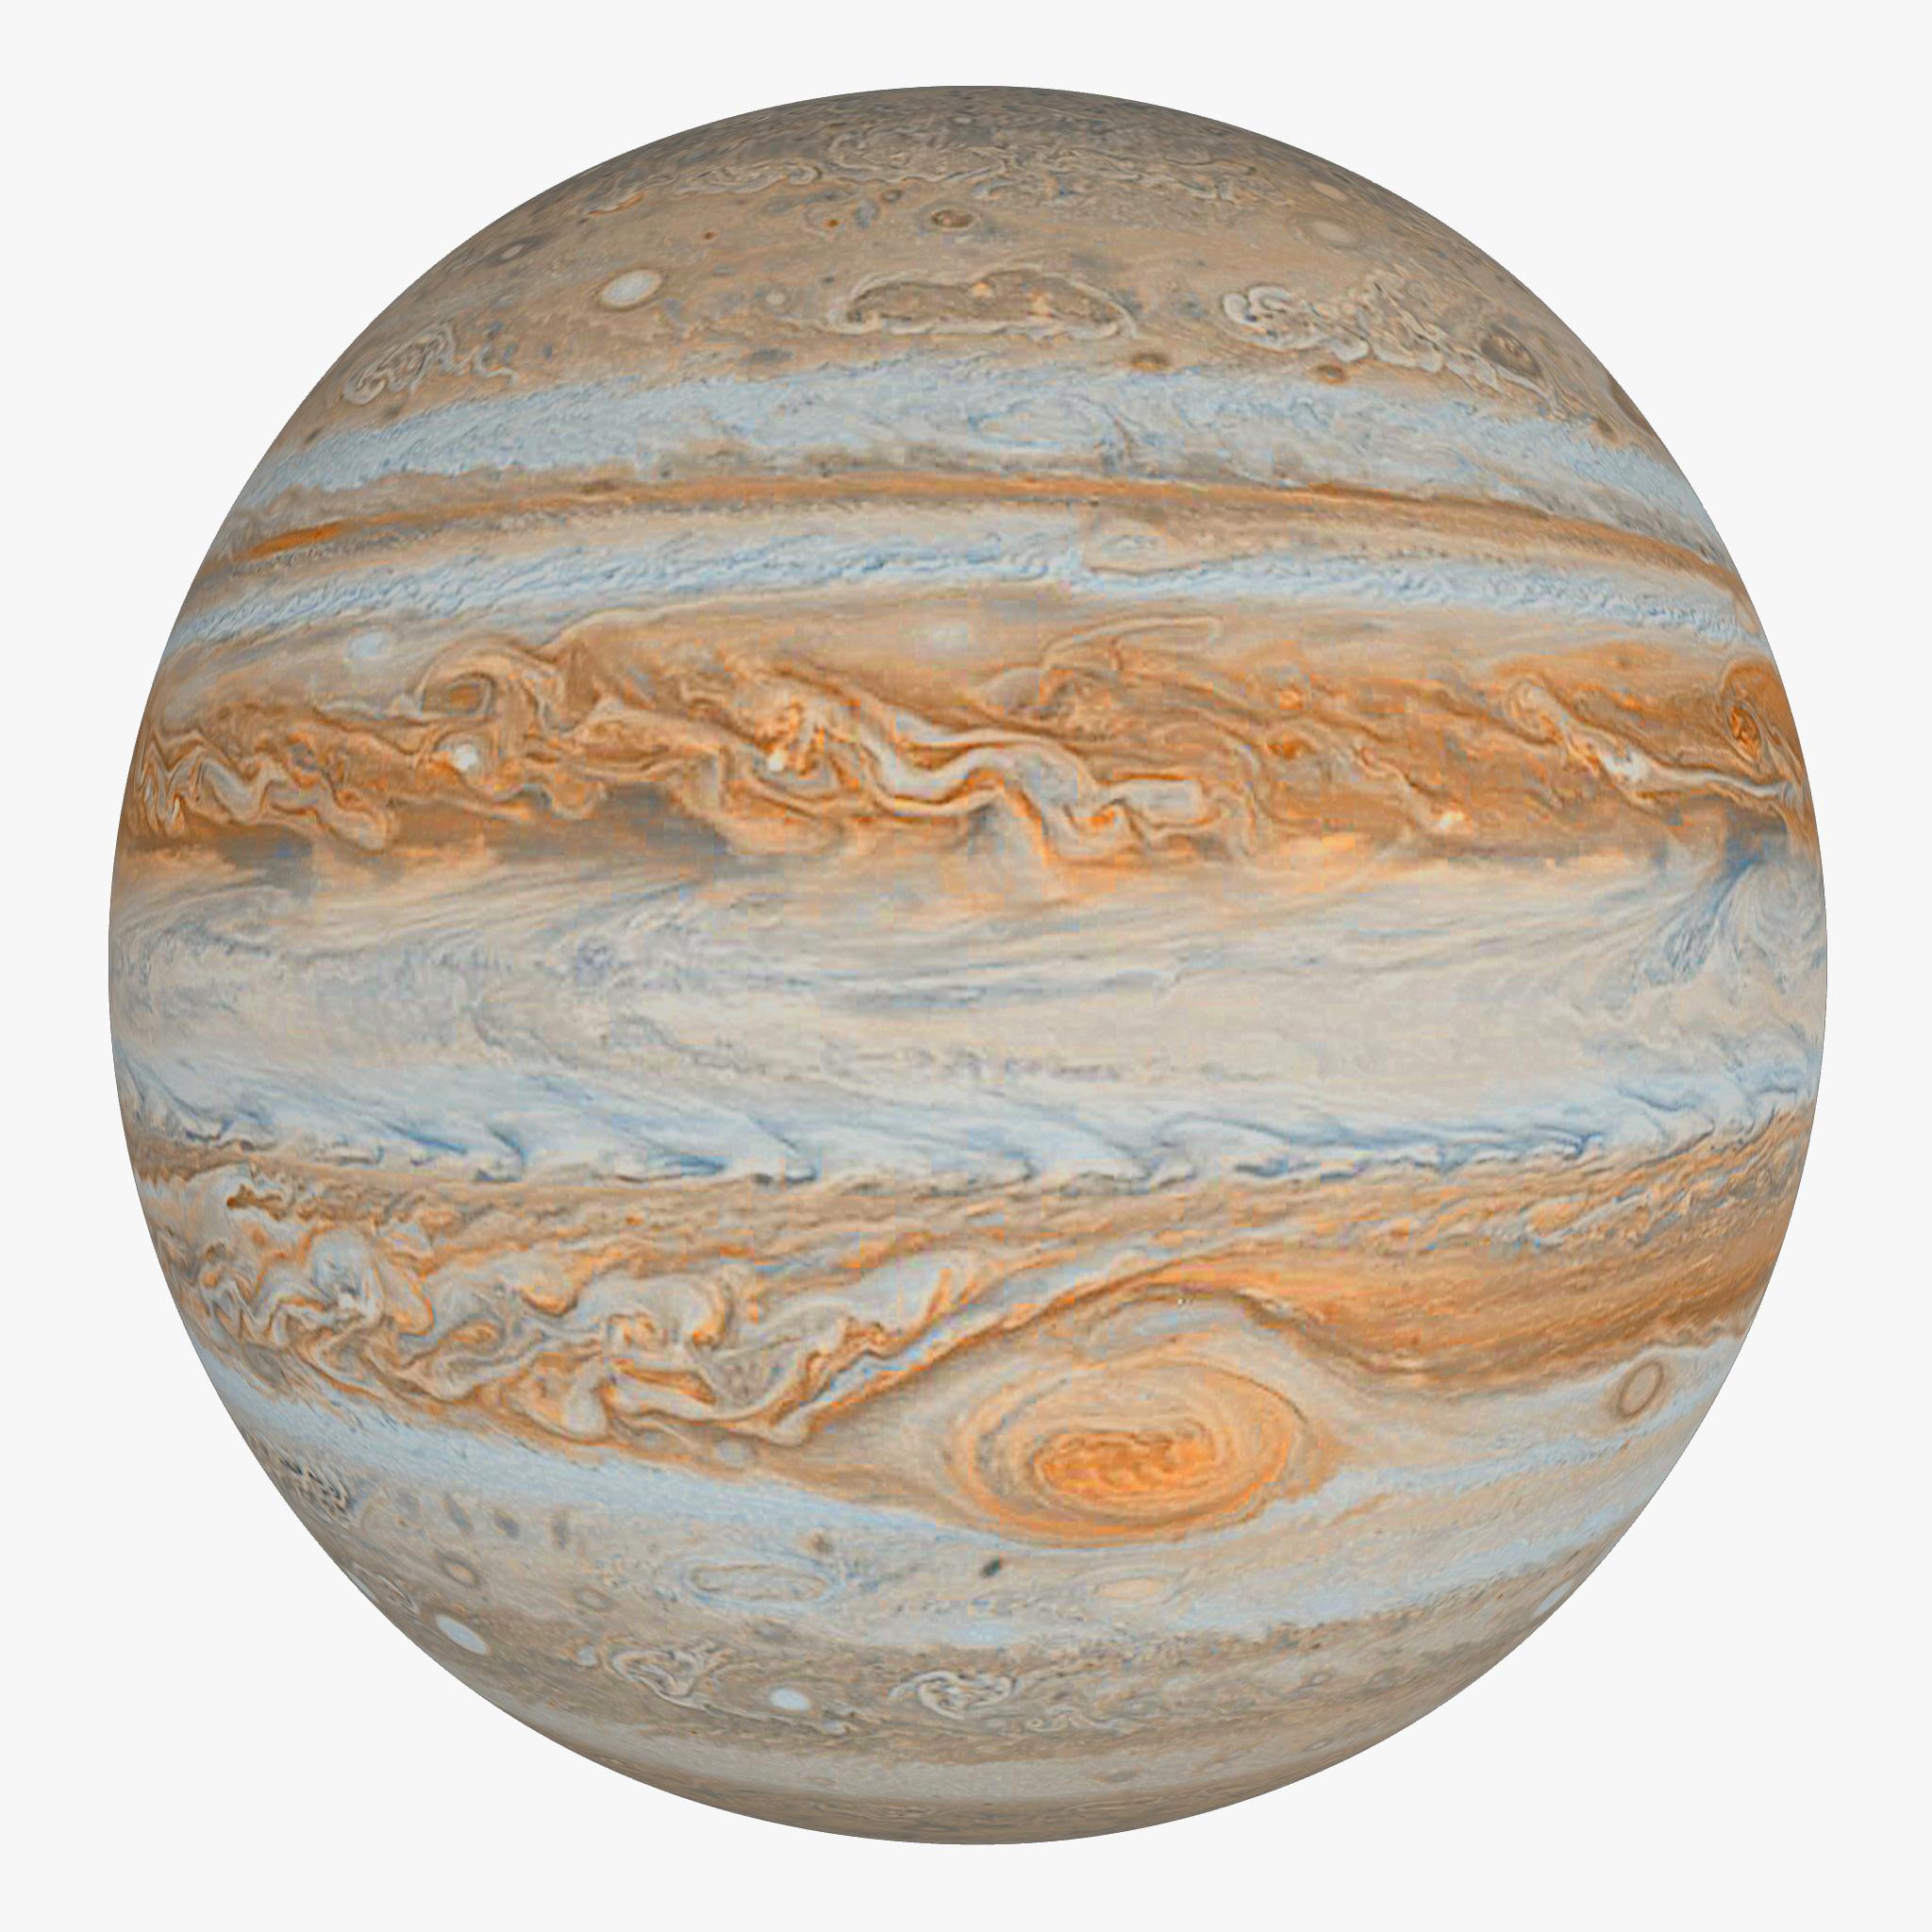 jupiter planet map hi res - photo #9